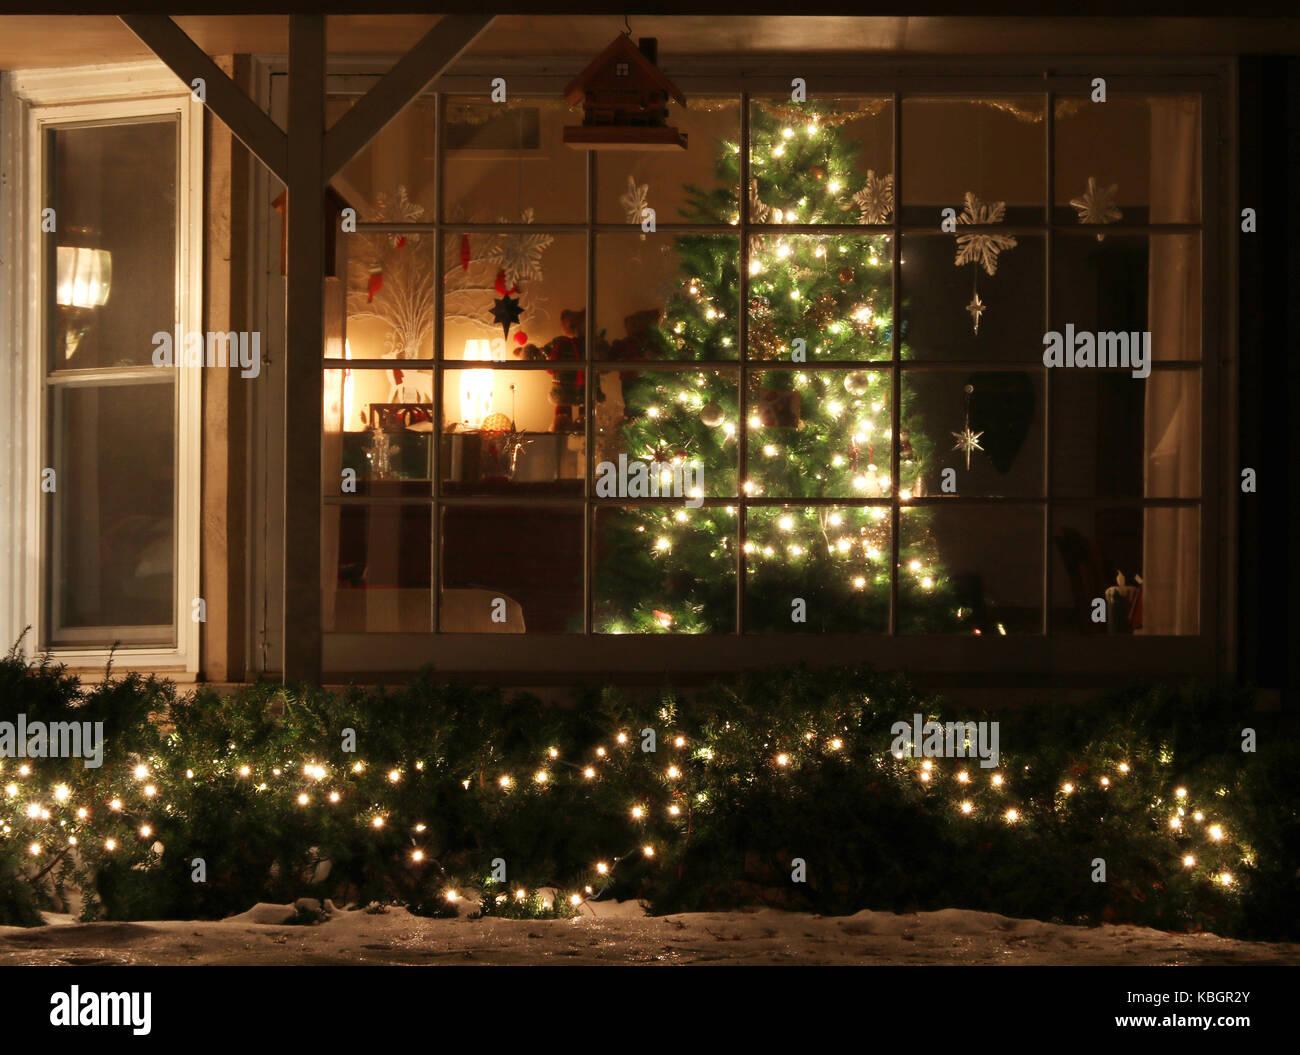 Ventana Con Decorado Iluminado árbol De Navidad Dentro De